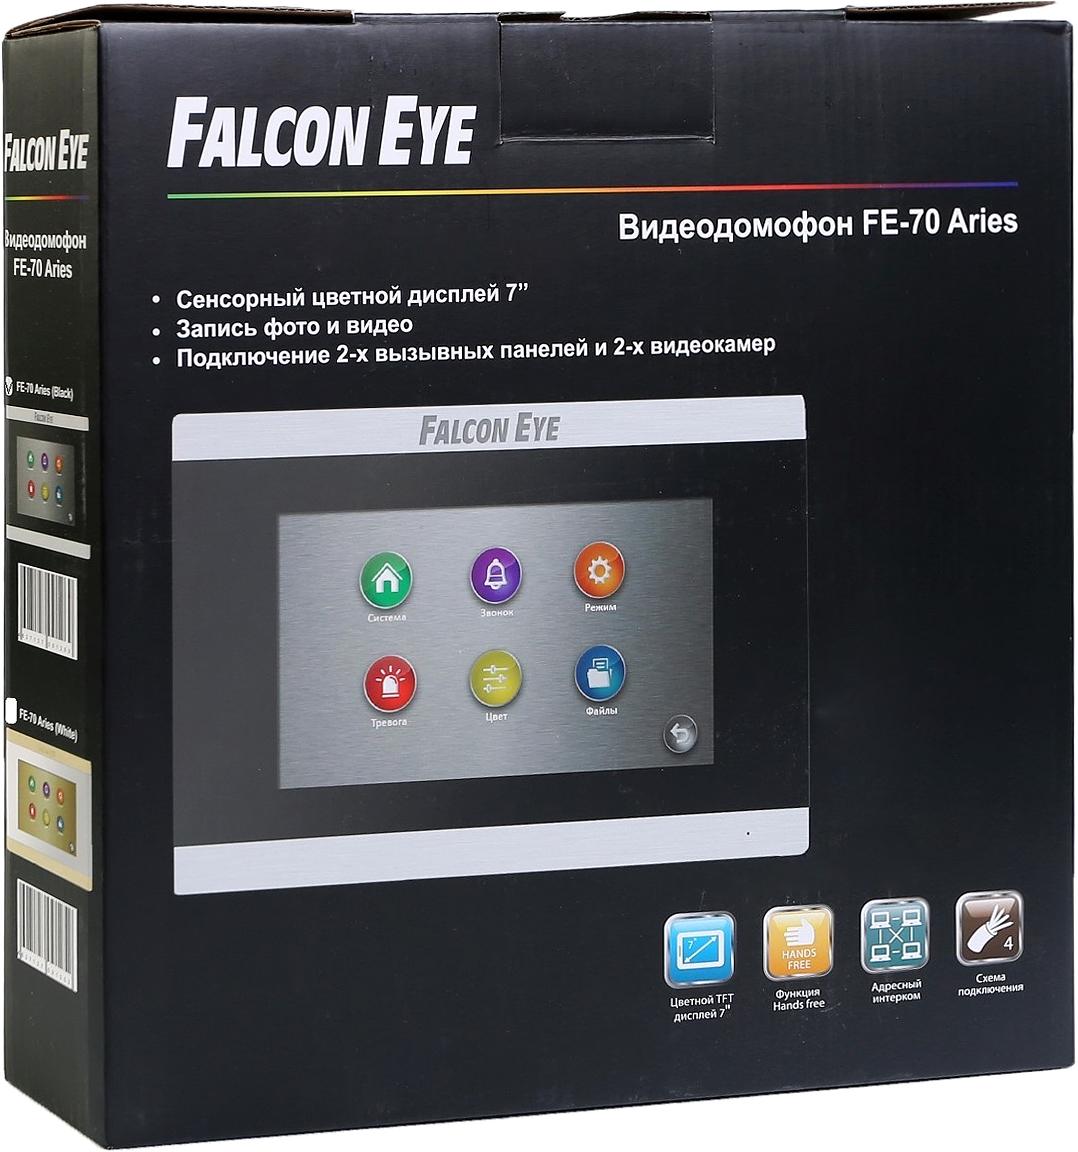 Falcon Eye FE-70 ARIES, Blackвидеодомофон Falcon Eye